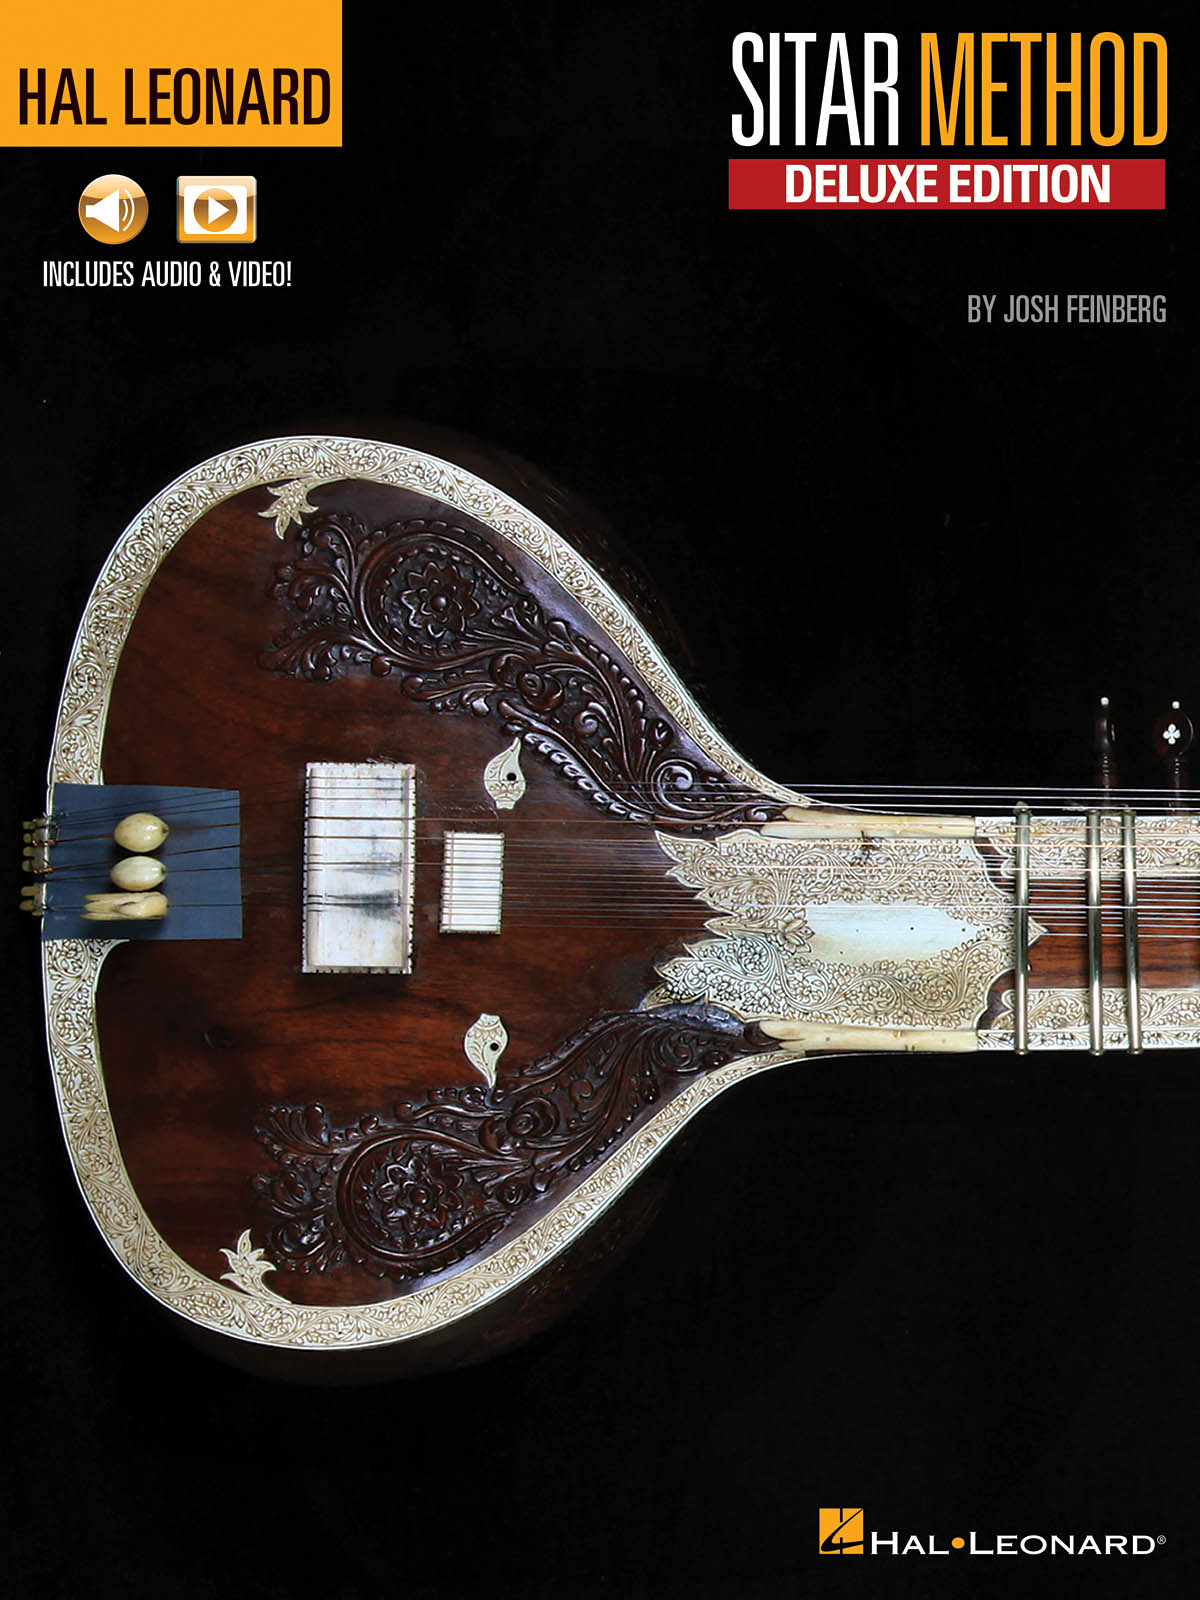 Josh Feinberg: Hal Leonard Sitar Method - Deluxe Edition: Other plucked strings: